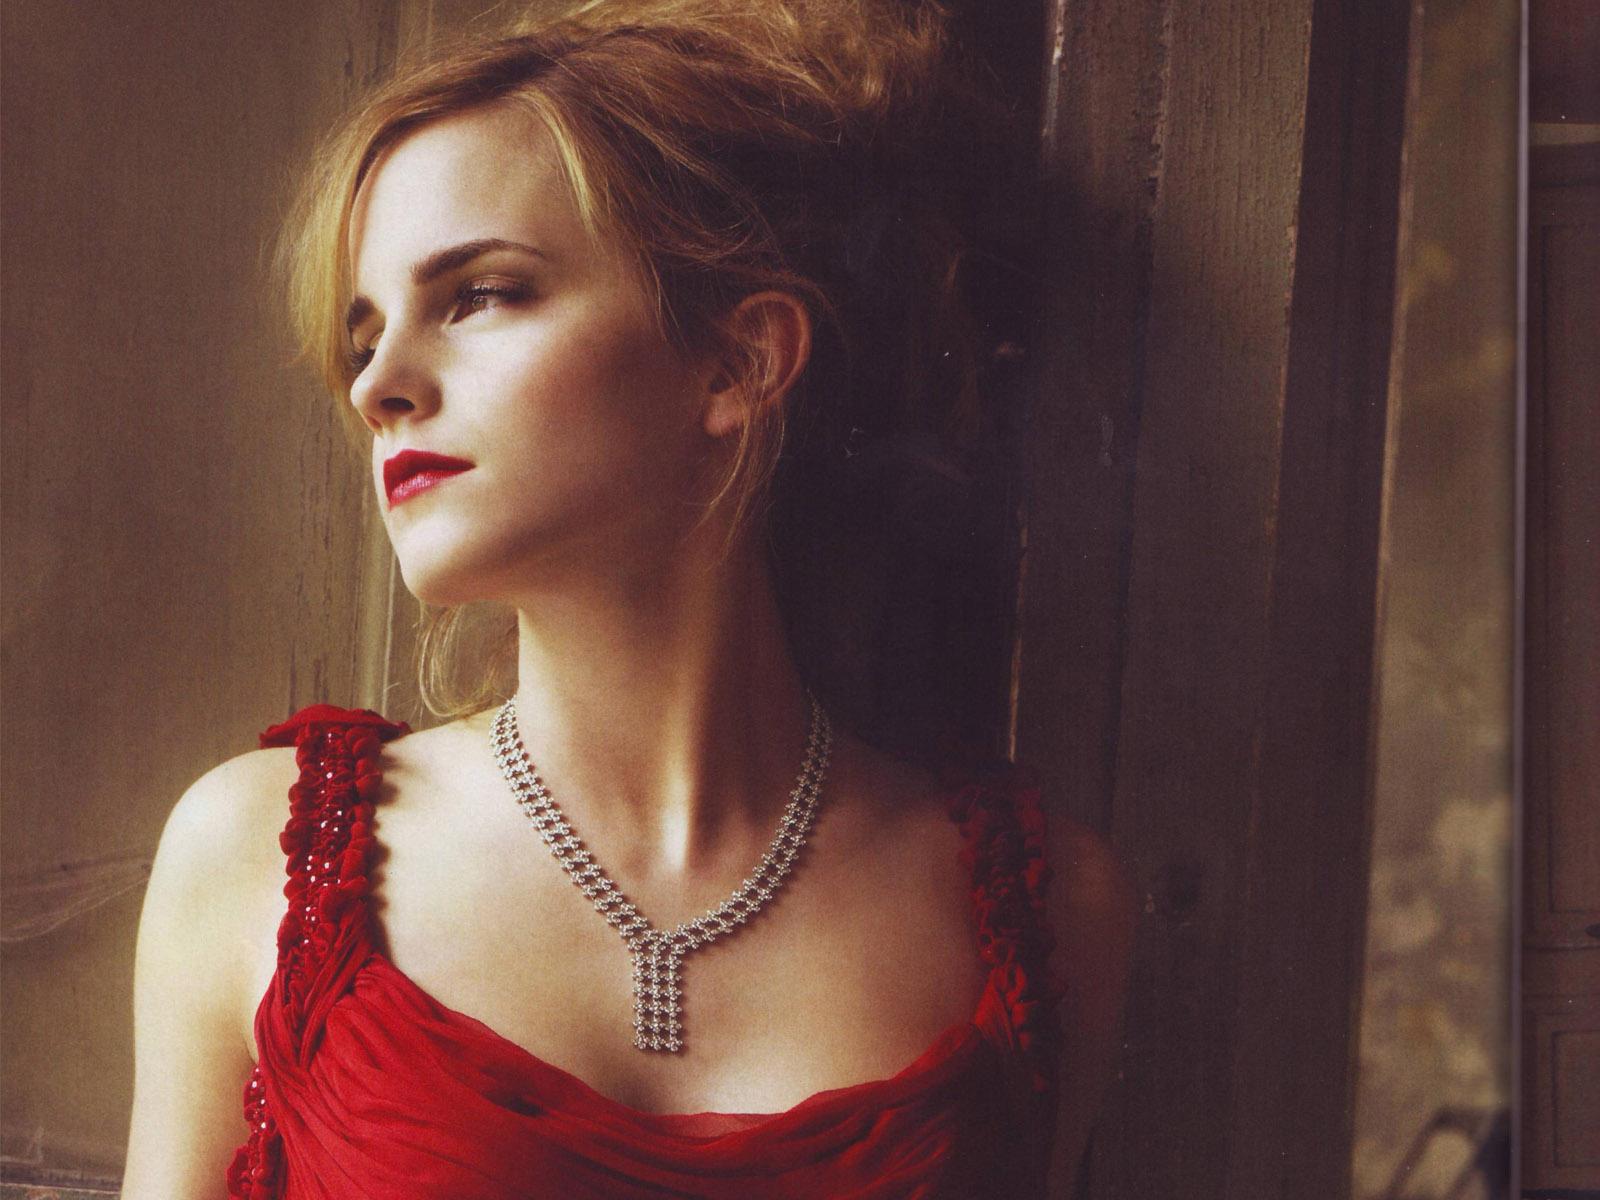 Emma Watson hd Hot Wallpapers 2012 All Hollywood Stars 1600x1200